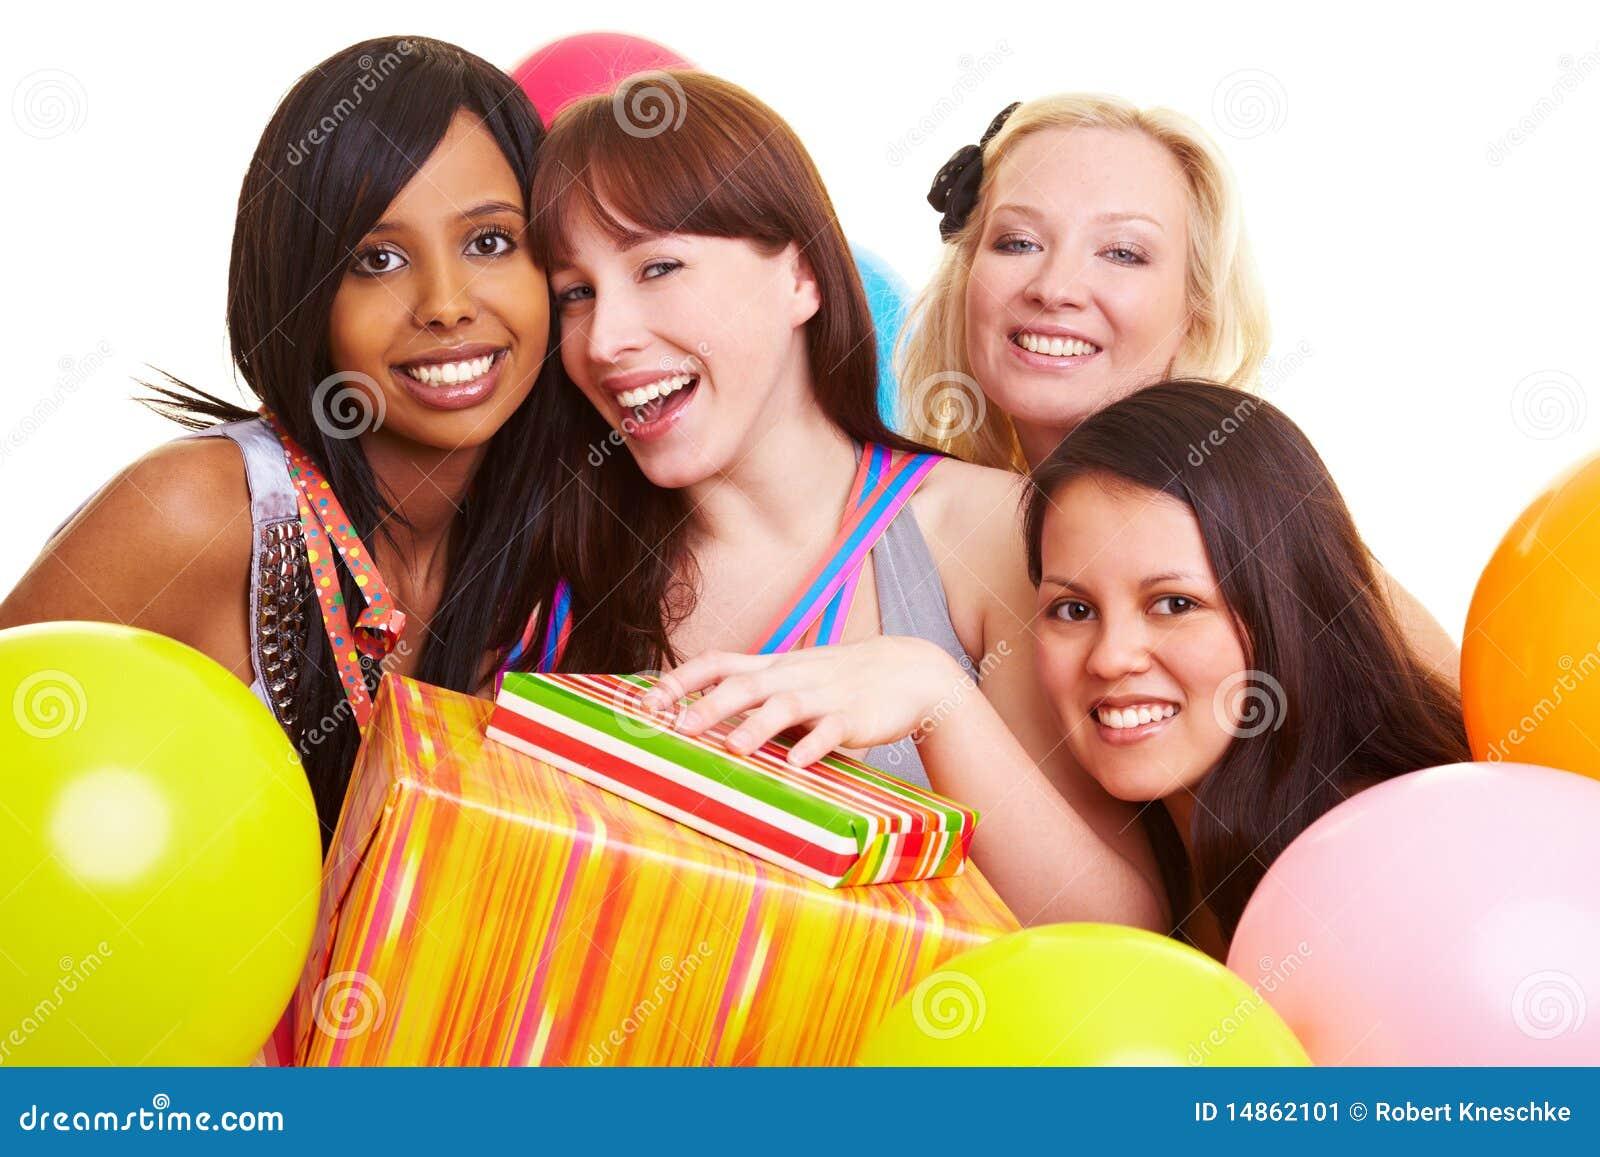 Four women celebrating a friends